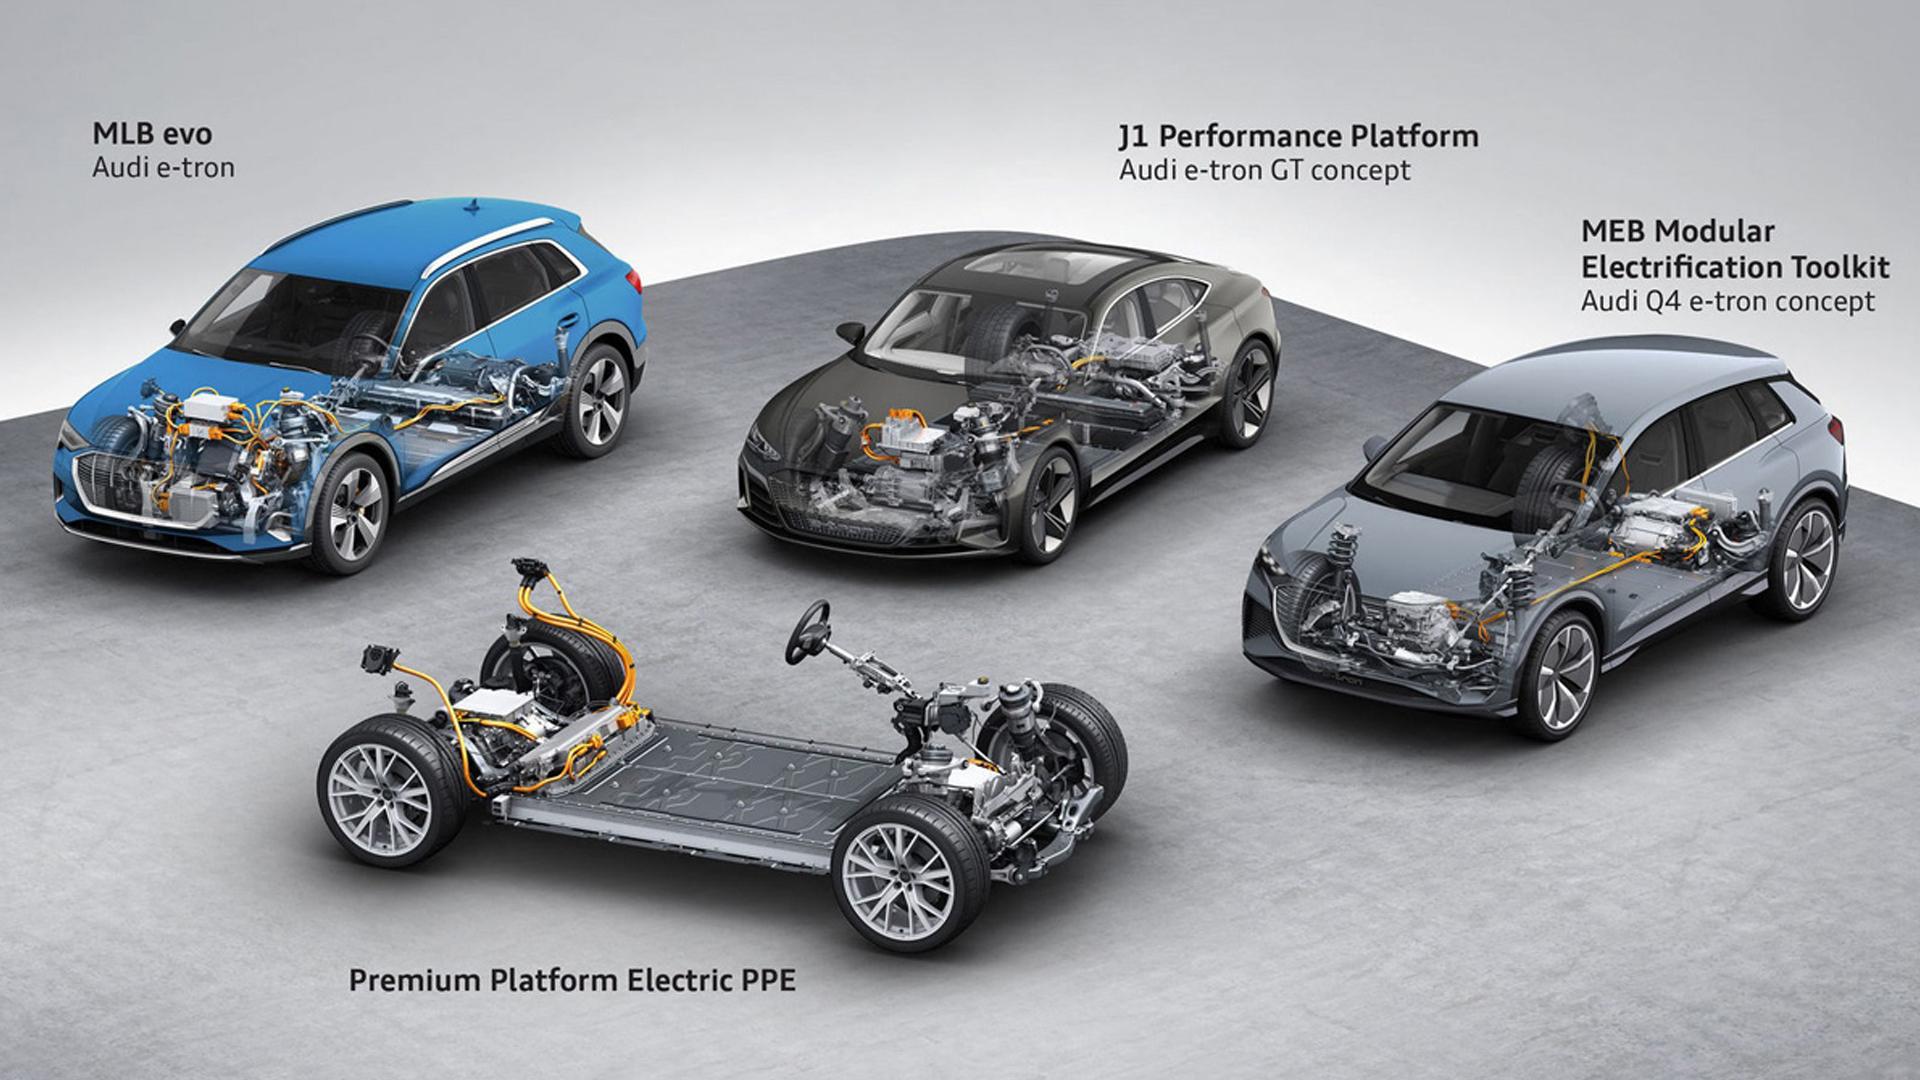 Audi electric platform model range